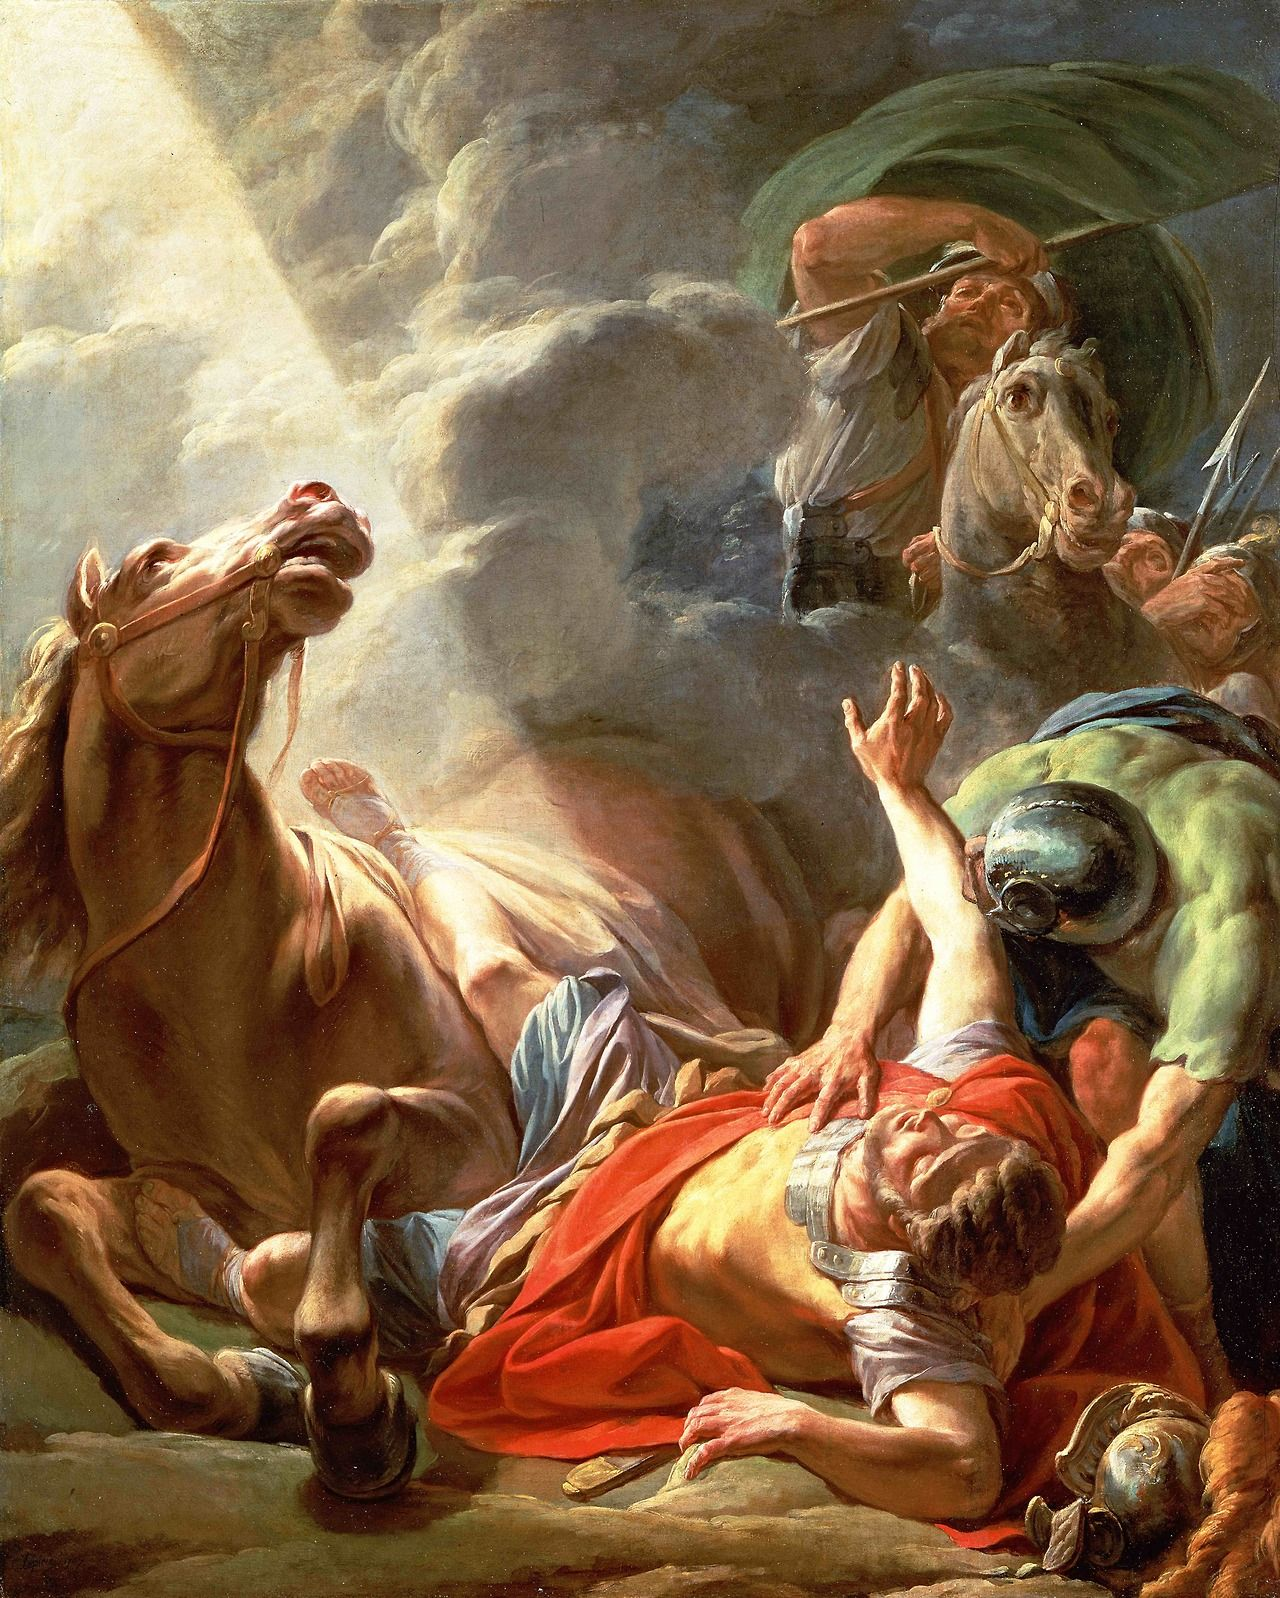 Sunday's Gospel features Jesus' stunning rebuke of St